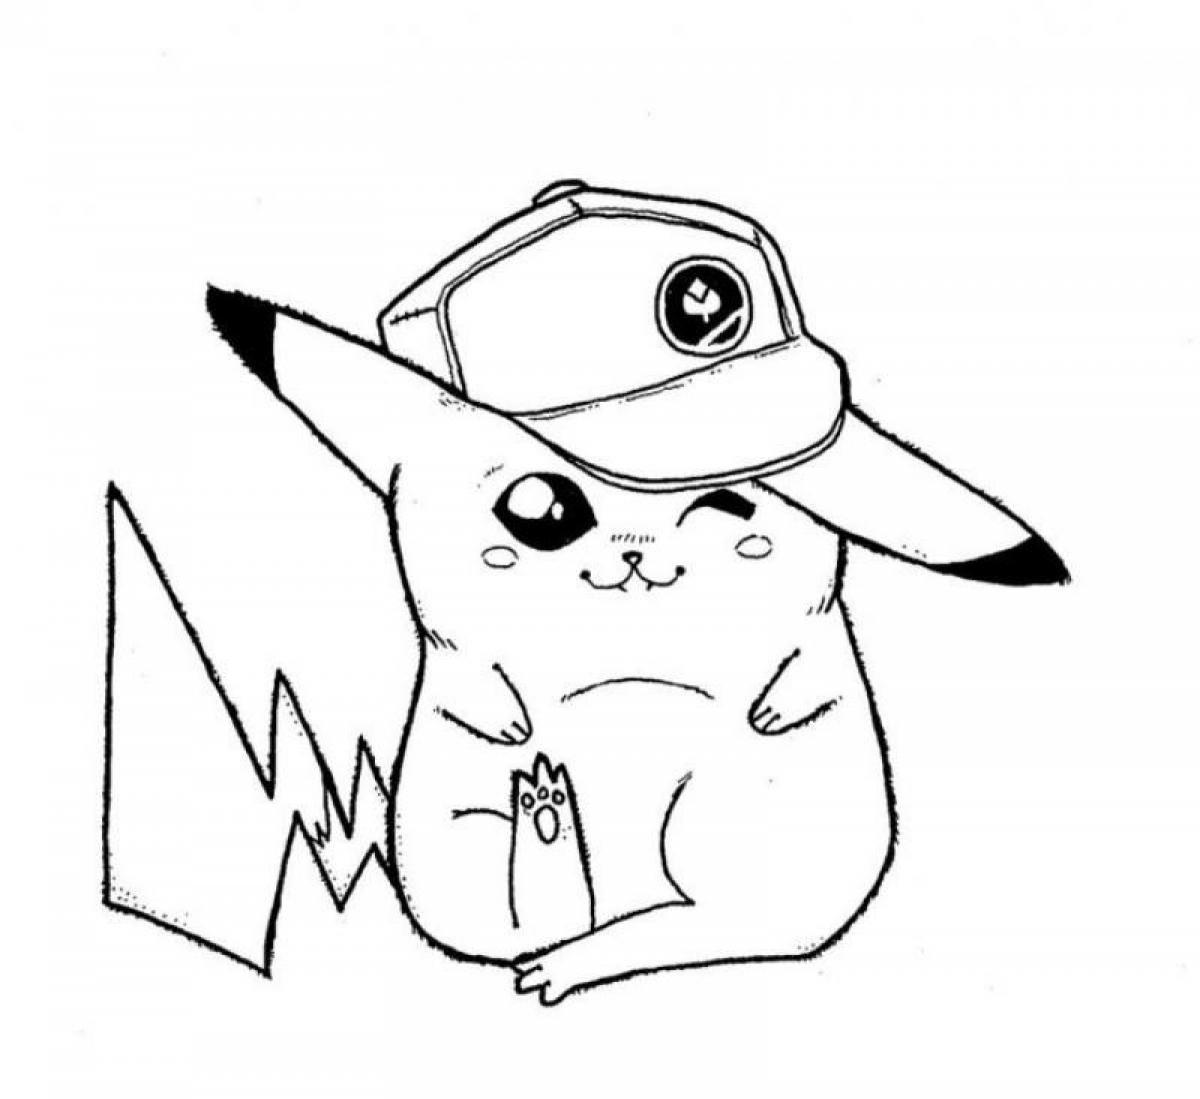 1200x1099 Cute Pikachu Coloring Pages Coloring Pages Unbelievable Pokemon